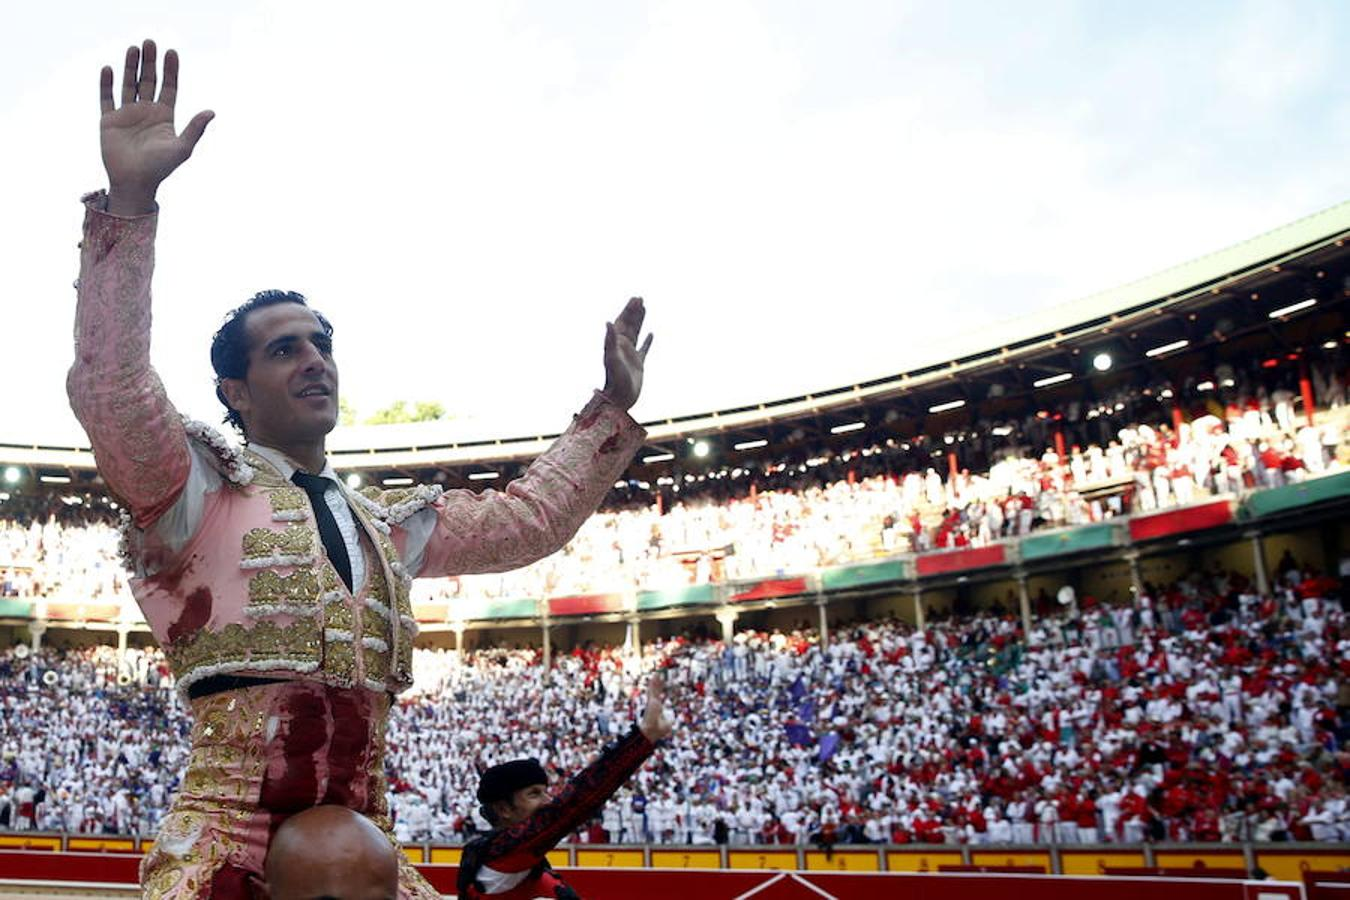 Iván Fandiño salió a hombros en la Feria de San Fermín 2014